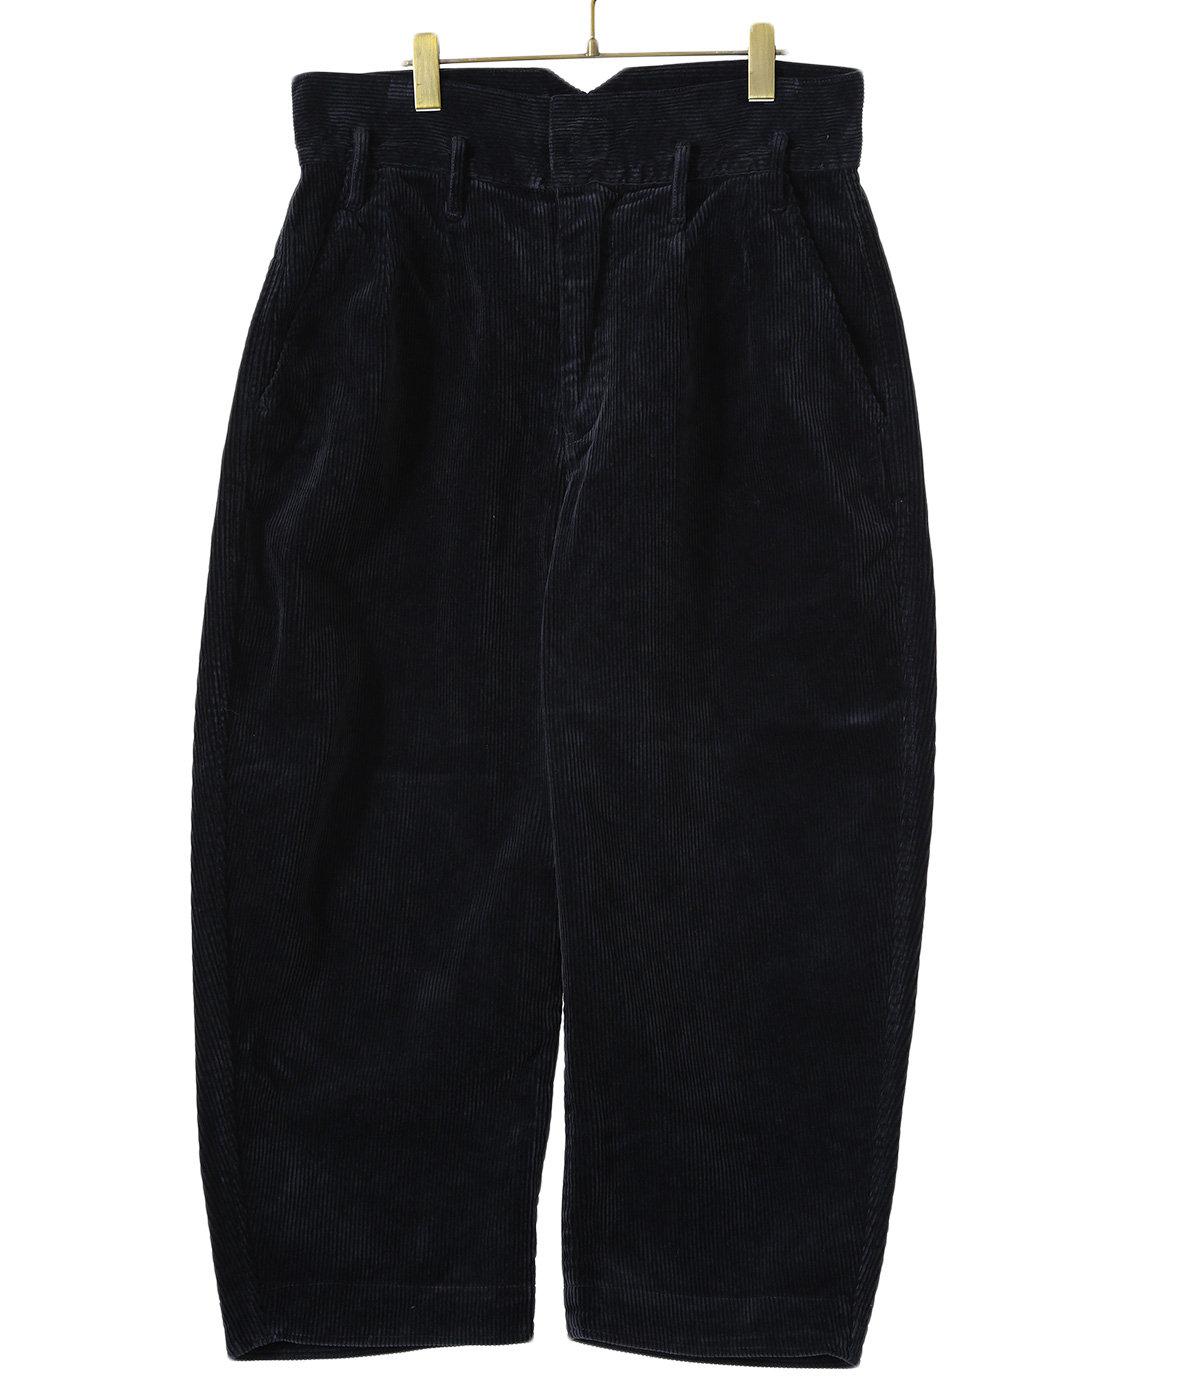 CORDUROY CLASSIC PANTS